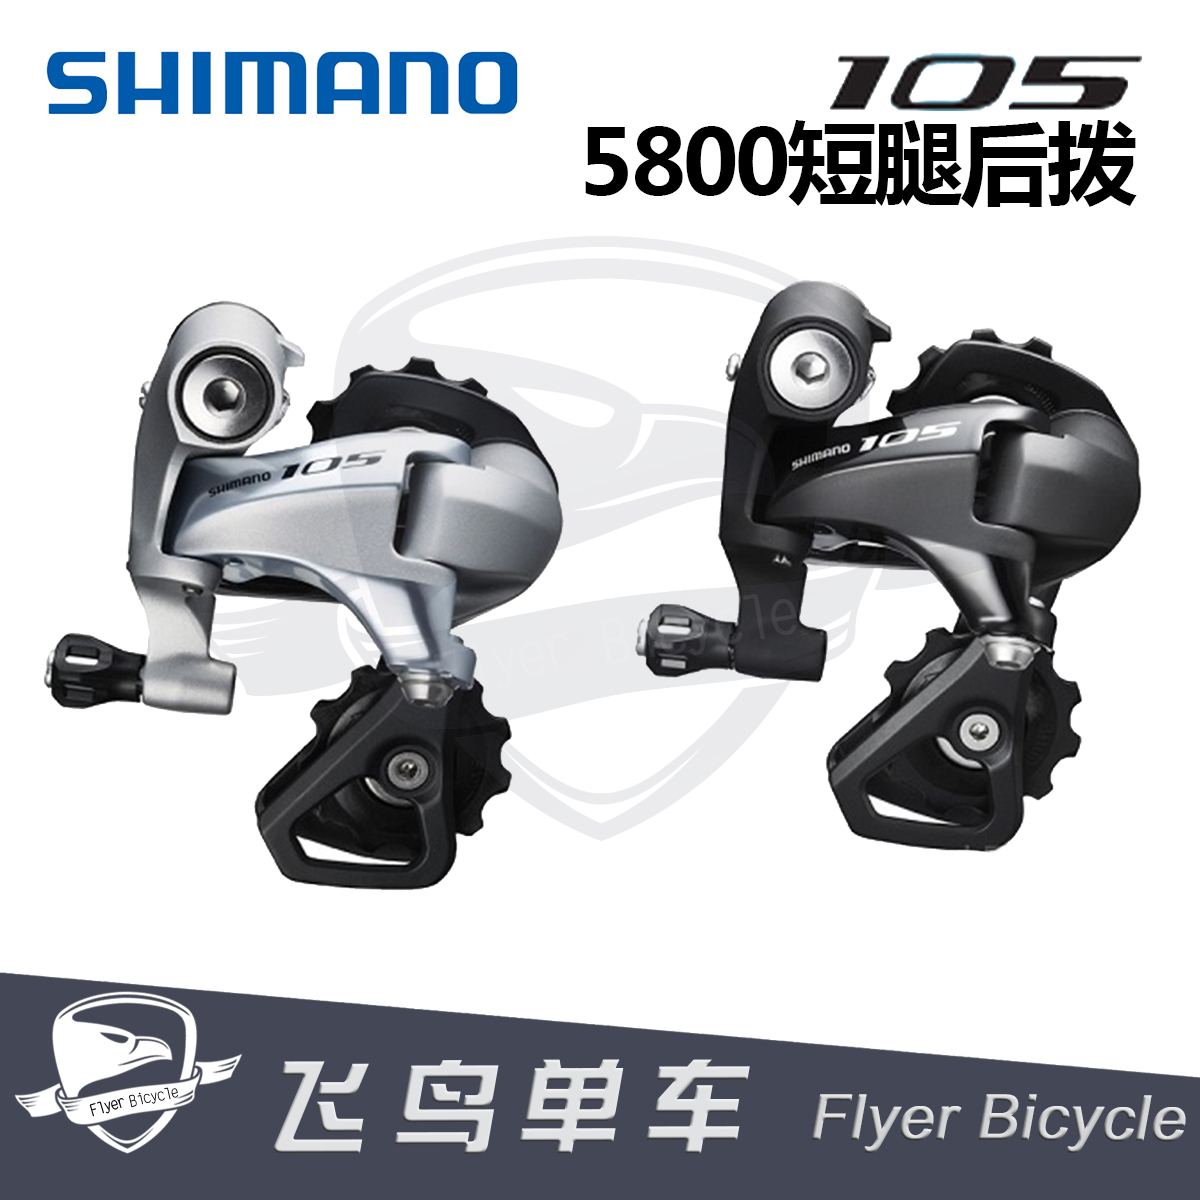 SHIMANO 105  5800 6800 11速短腿后拨 中腿后拨 折叠车 公路车